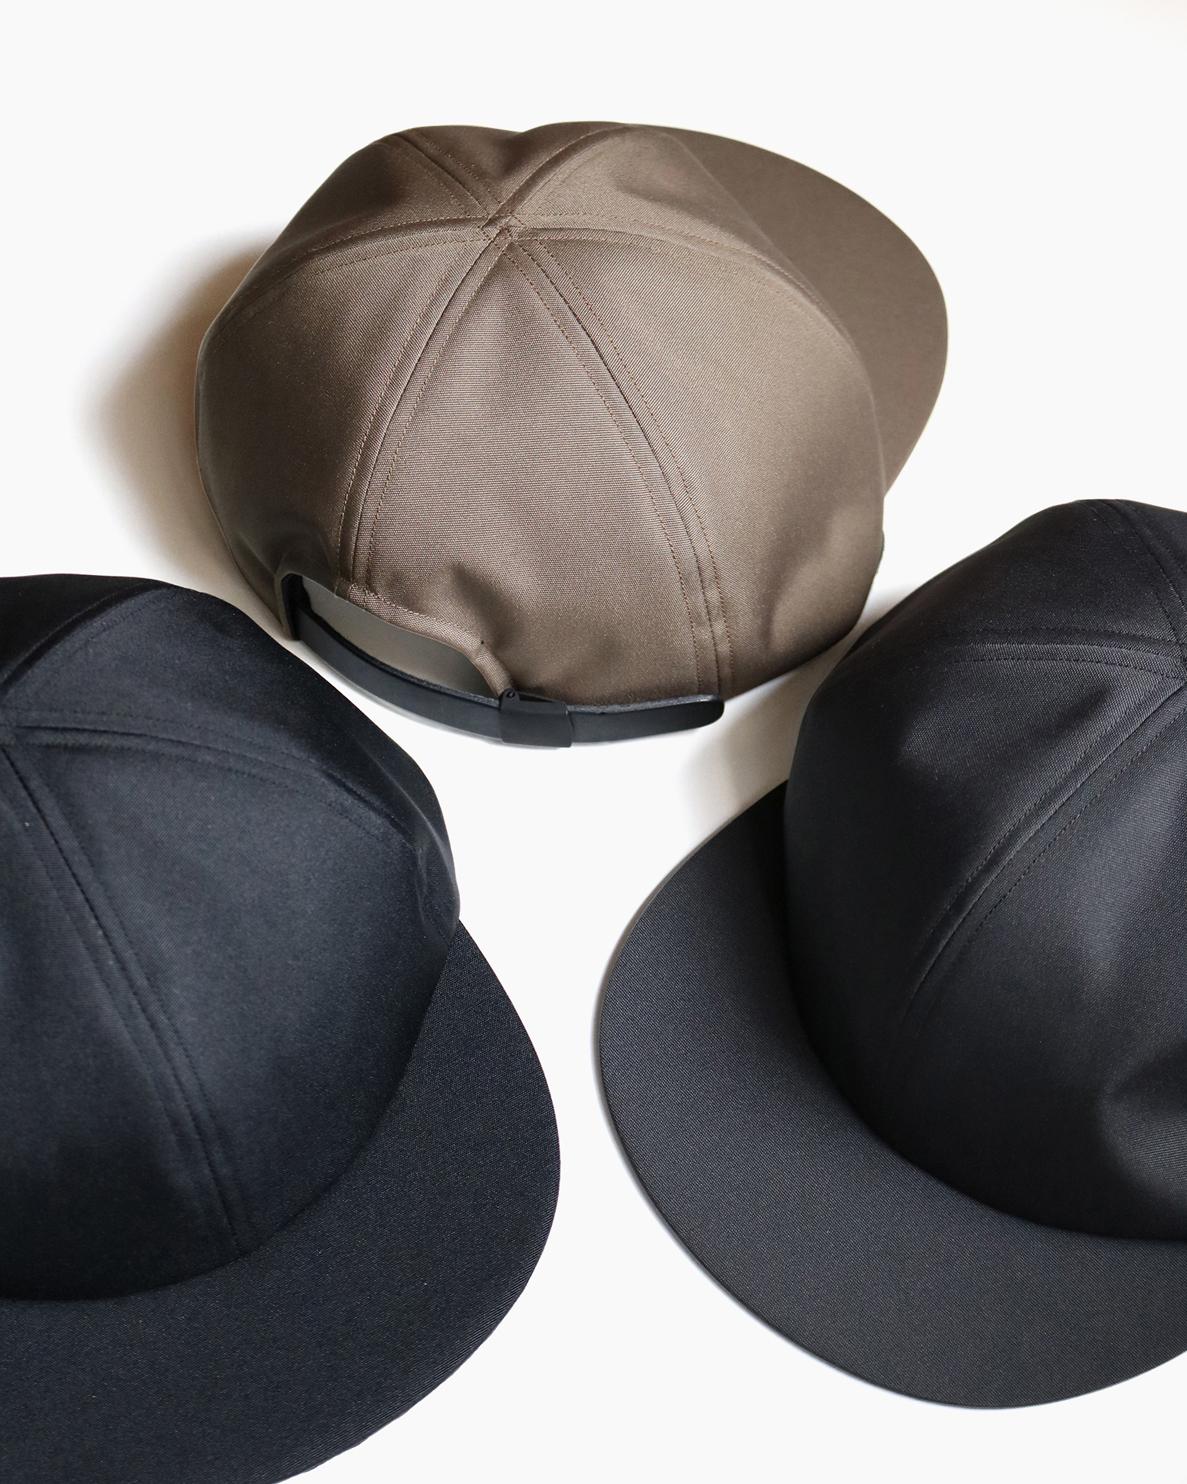 CORDURA LITTLE BRIM CAP -  Charcoal|COMESANDGOES